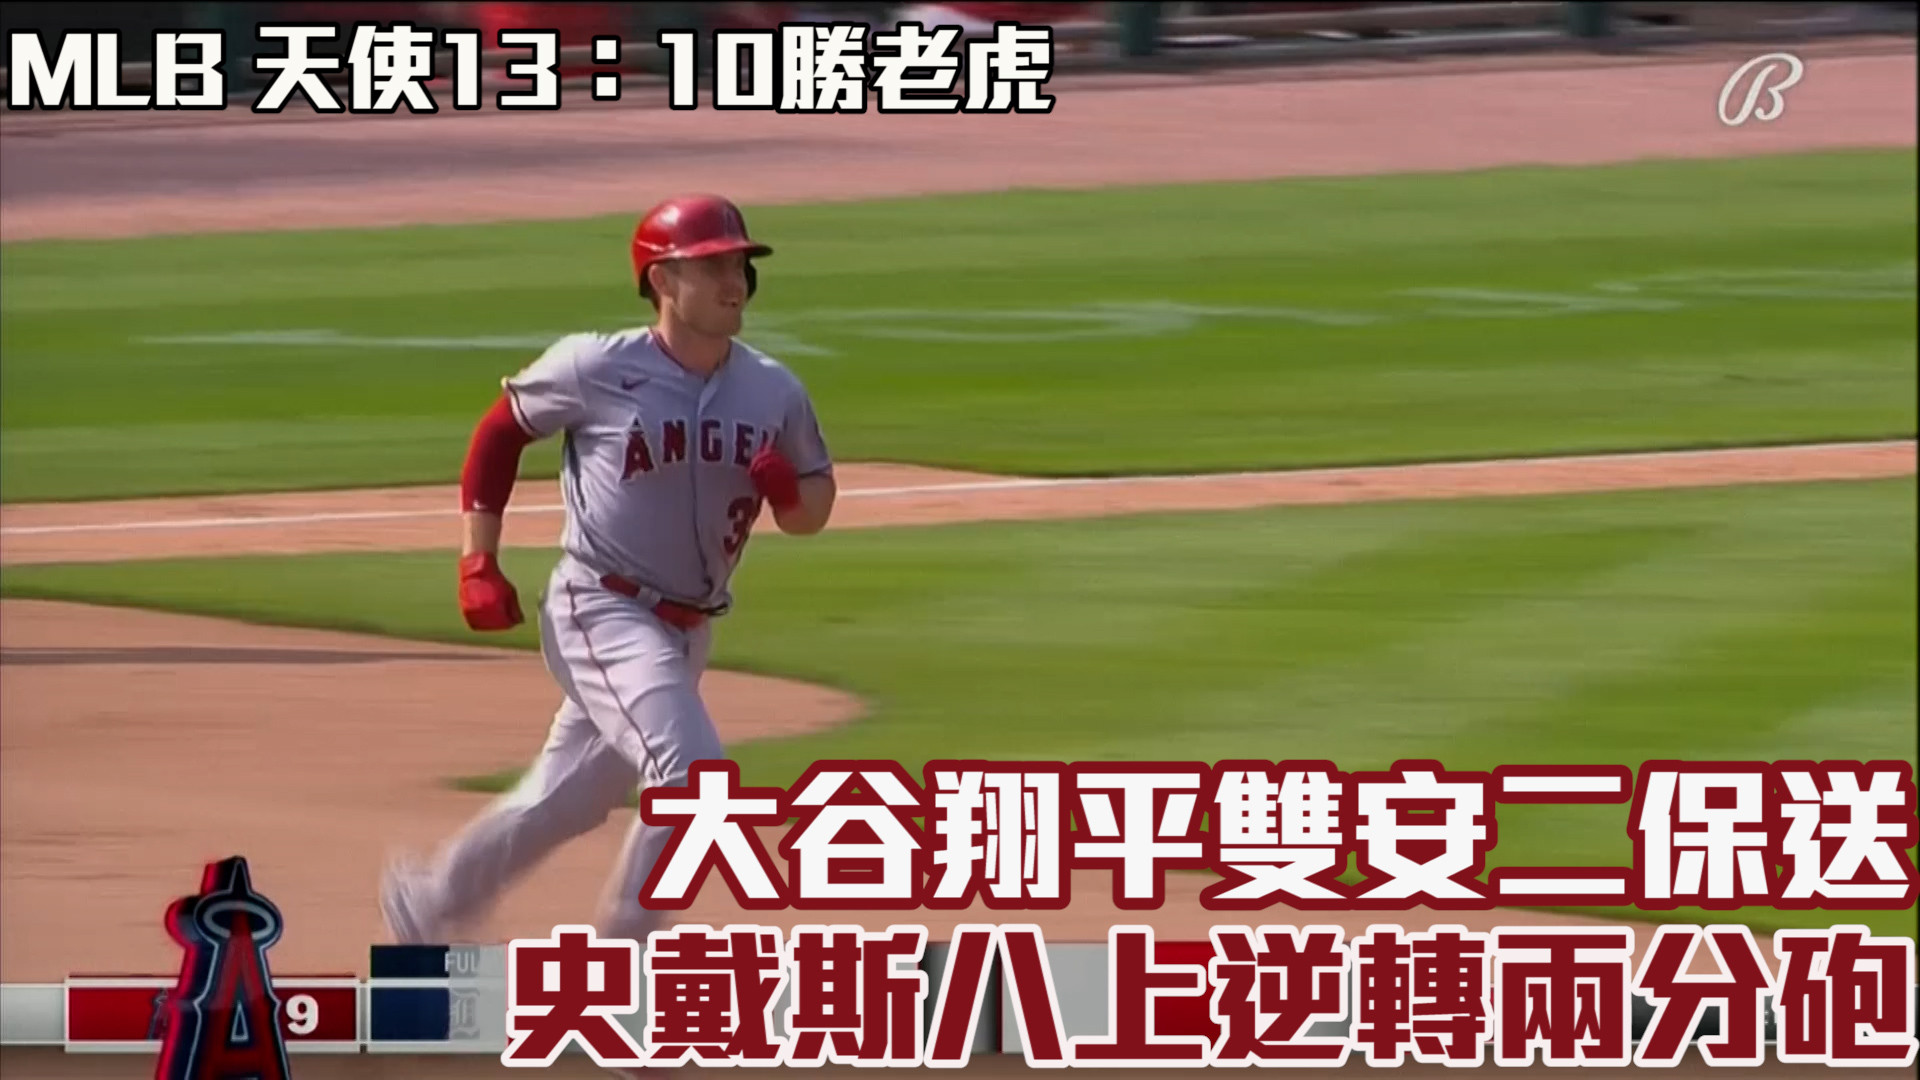 【MLB看愛爾達】大谷翔平雙安二保送 天使大逆轉老虎 08/20